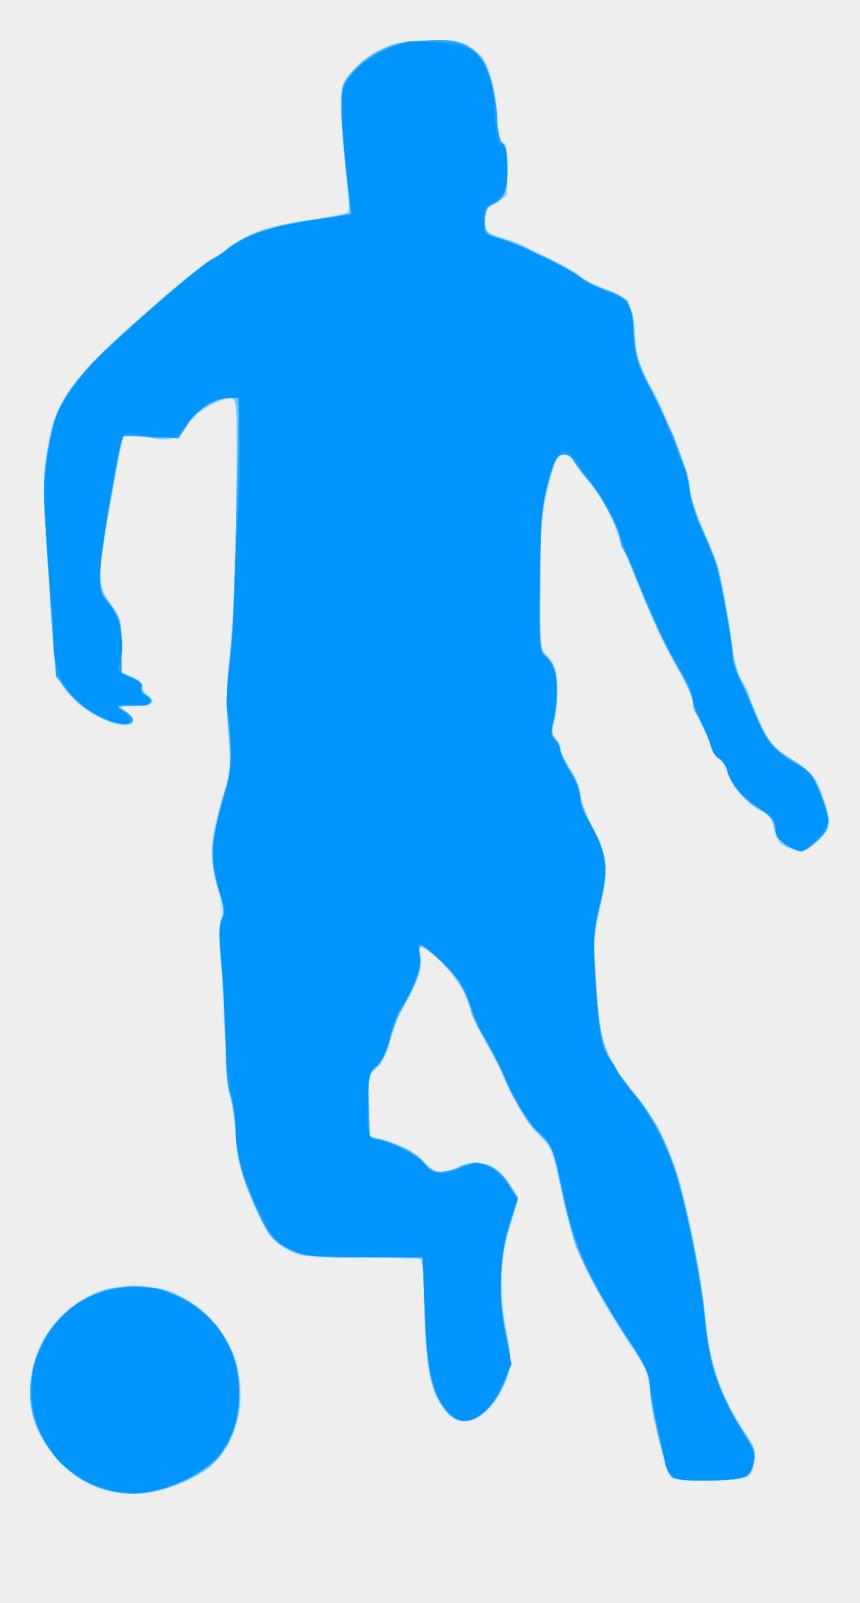 football player silhouette clipart, Cartoons - Silhouette Football 11 Icons Png - Silhouette Football Png Blue